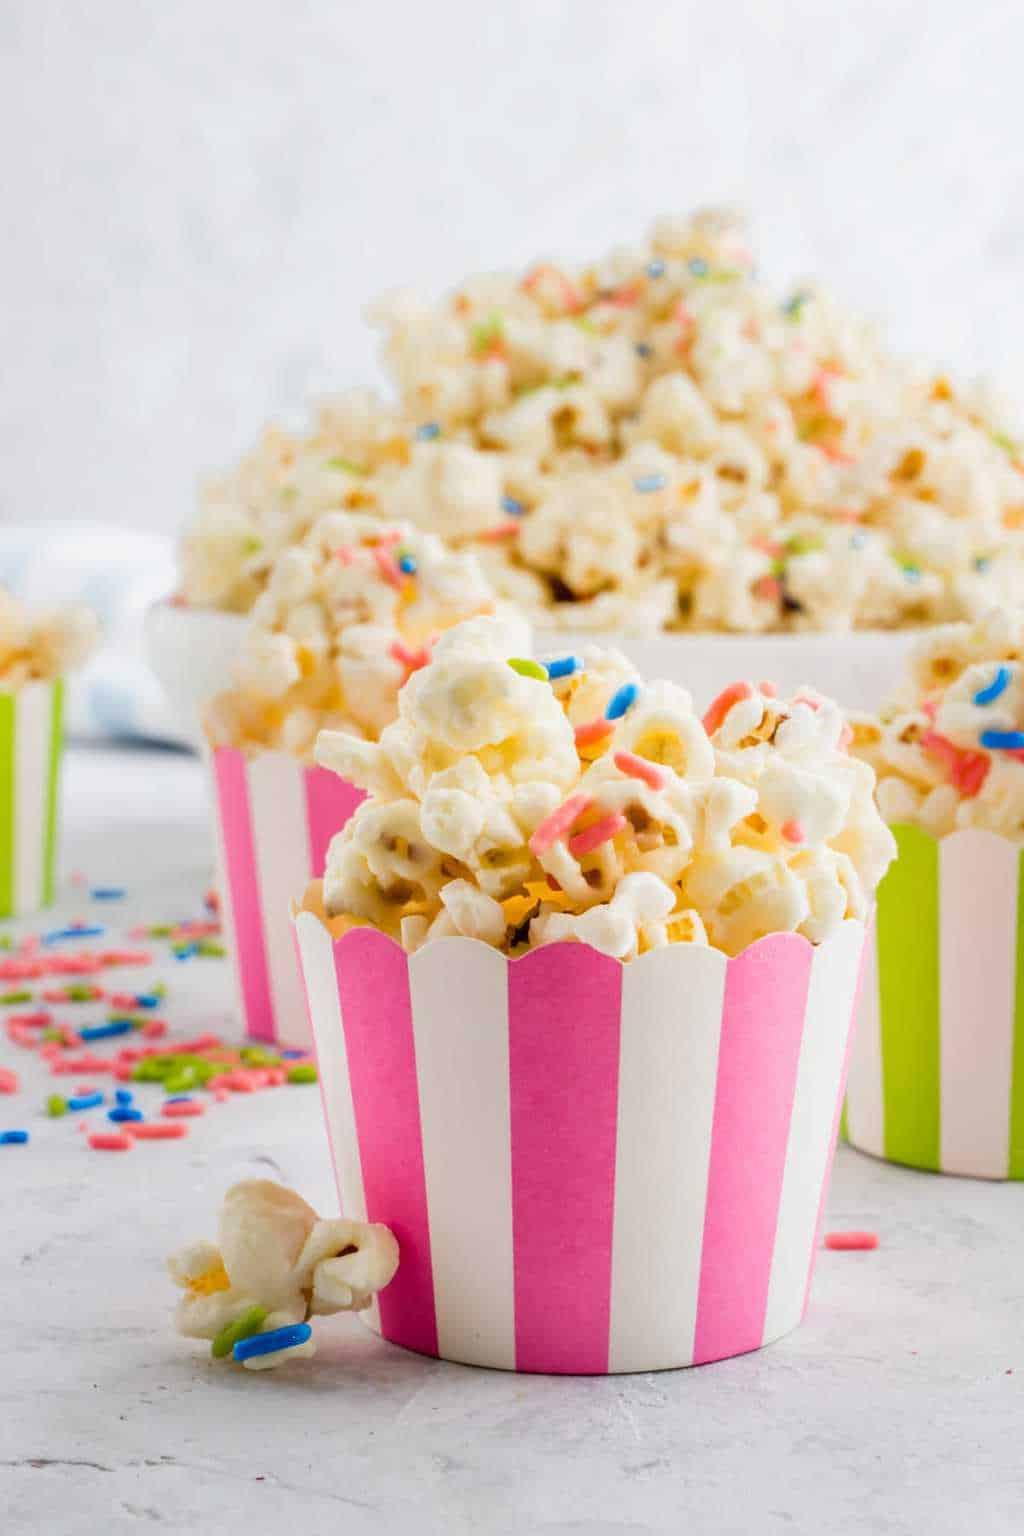 best white chocolate funfetti popcorn by top Houston lifesyle blogger Ashley Rose of Sugar and Cloth #recipes #entertaining #idea